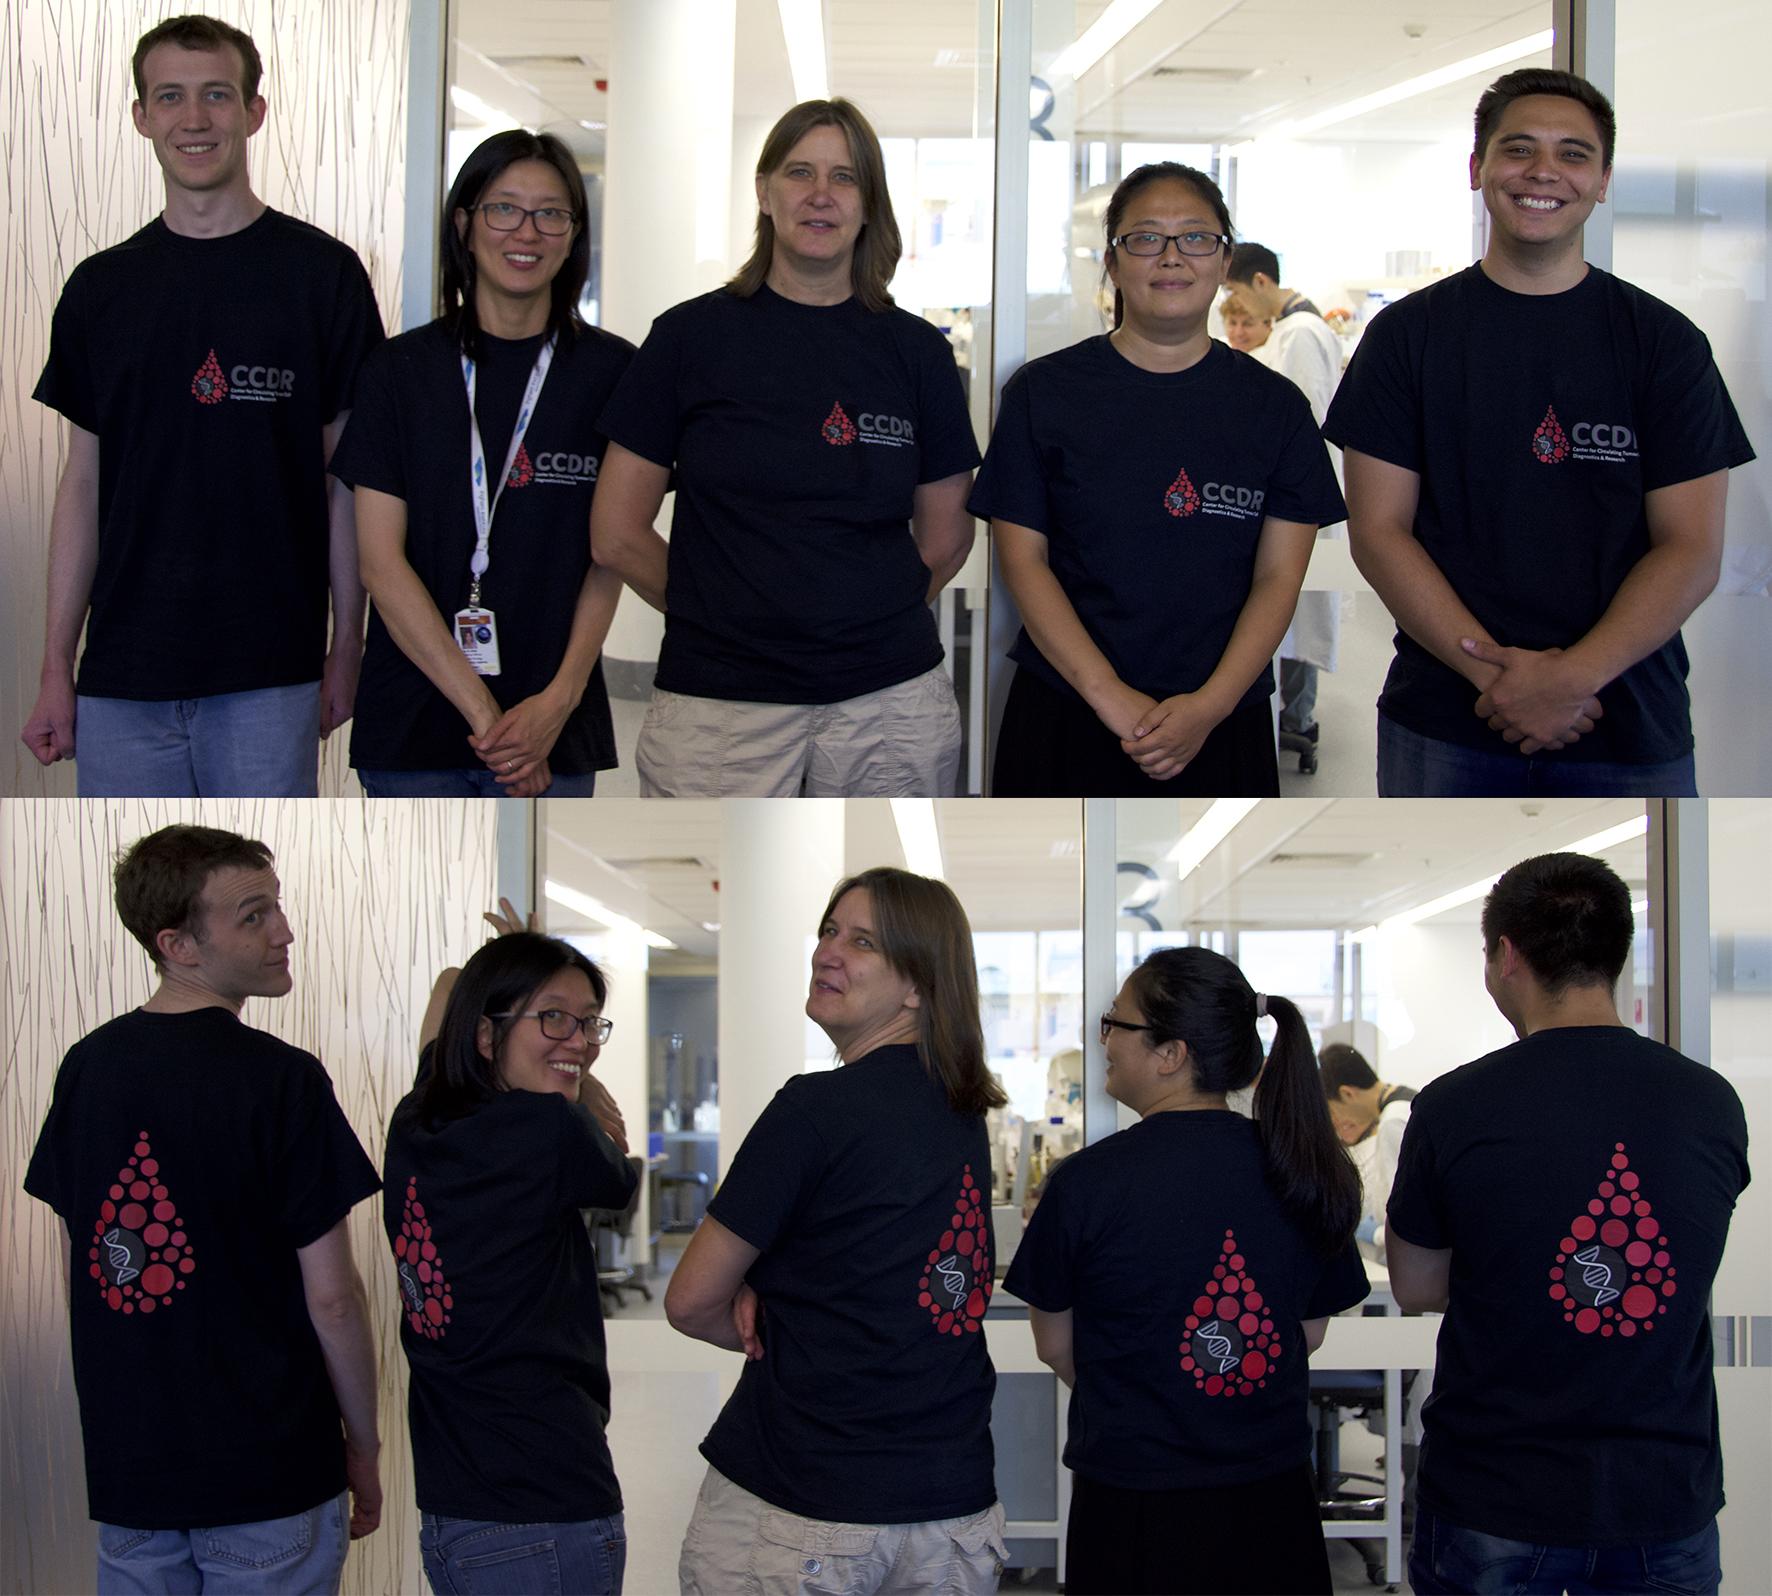 T-shirt-front-back.jpg